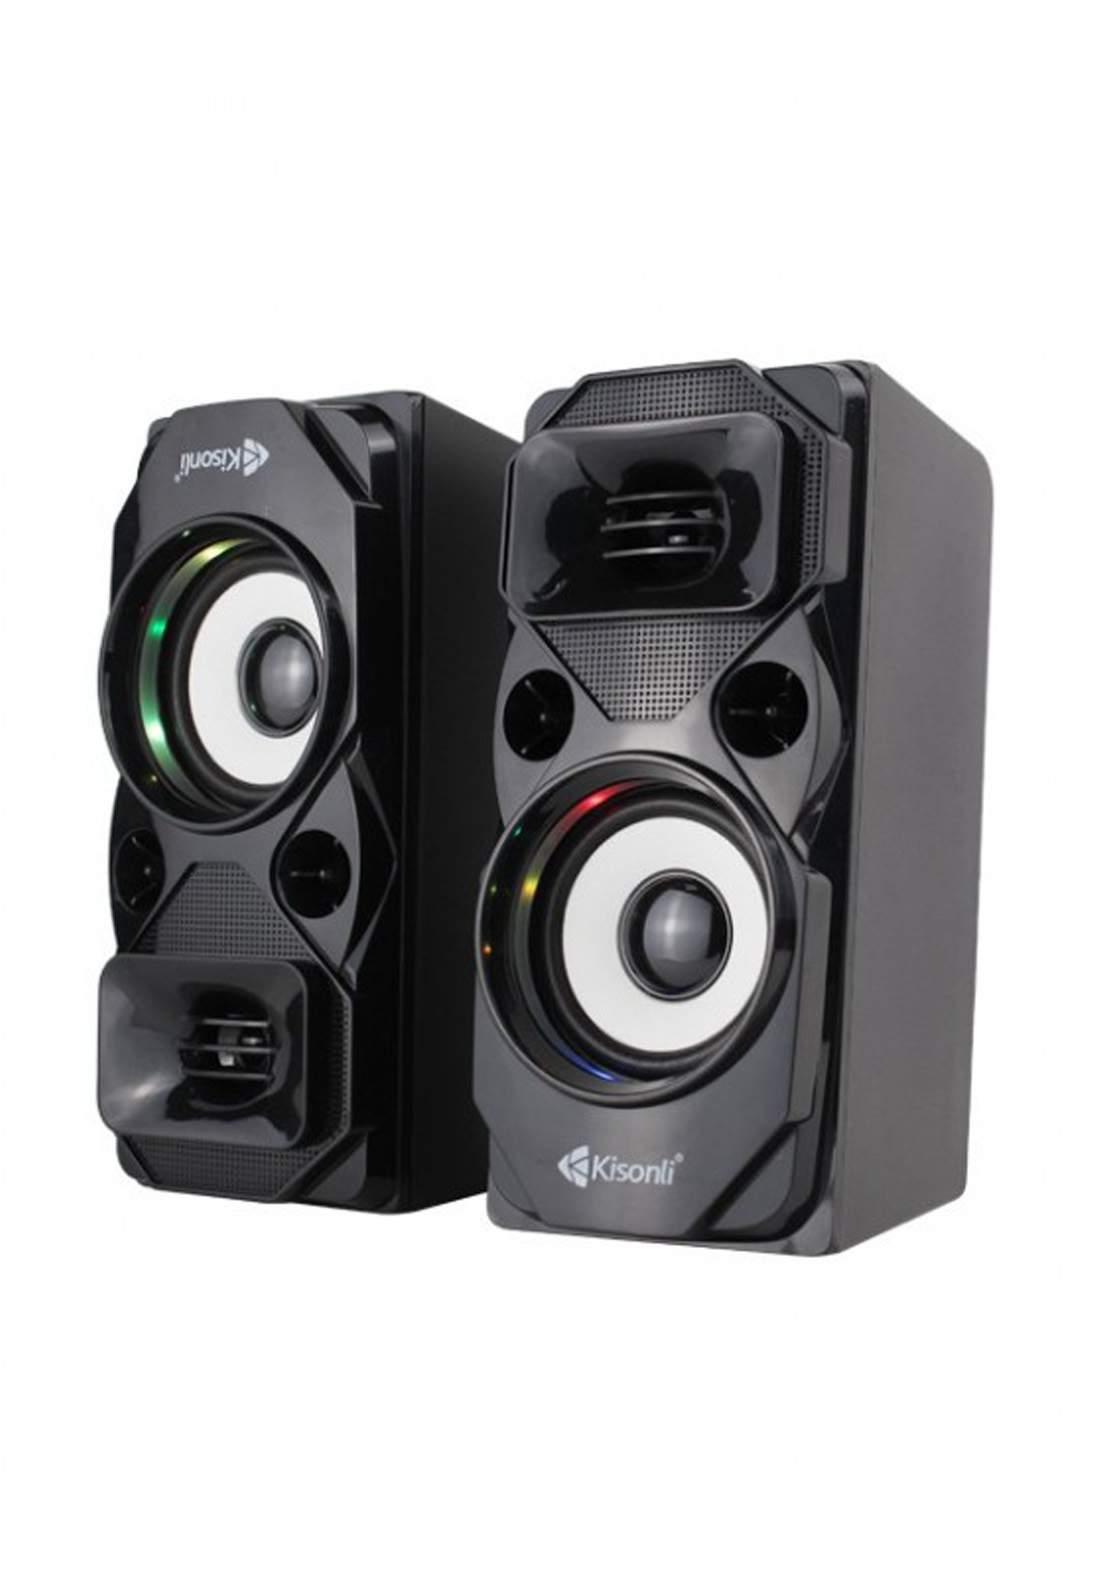 Kisonli U-9004 USB 2.0 Speaker - Black سبيكر